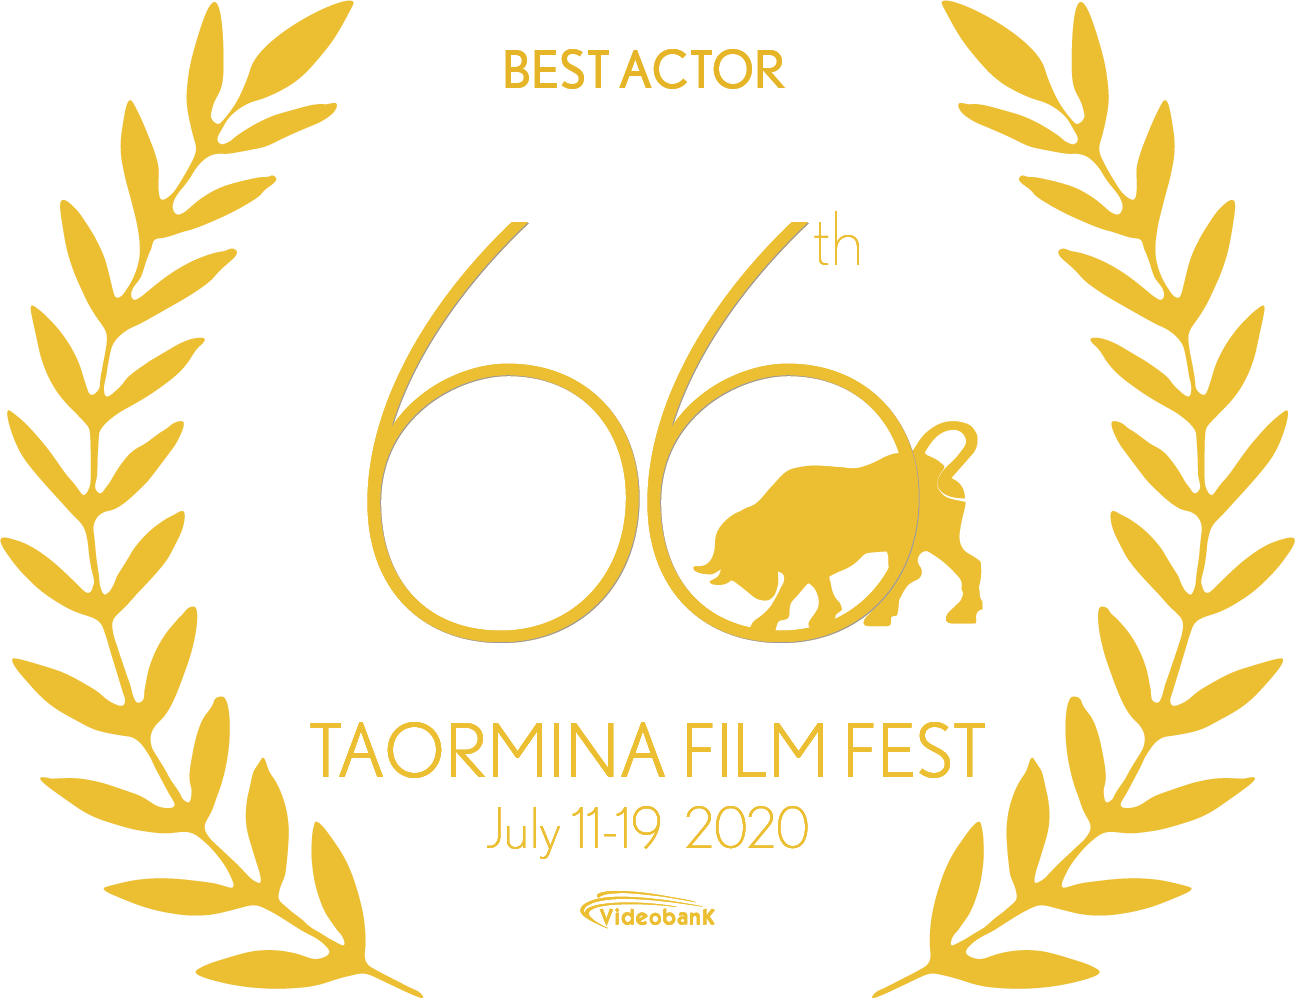 Taormina Film Fest Best Actor Award